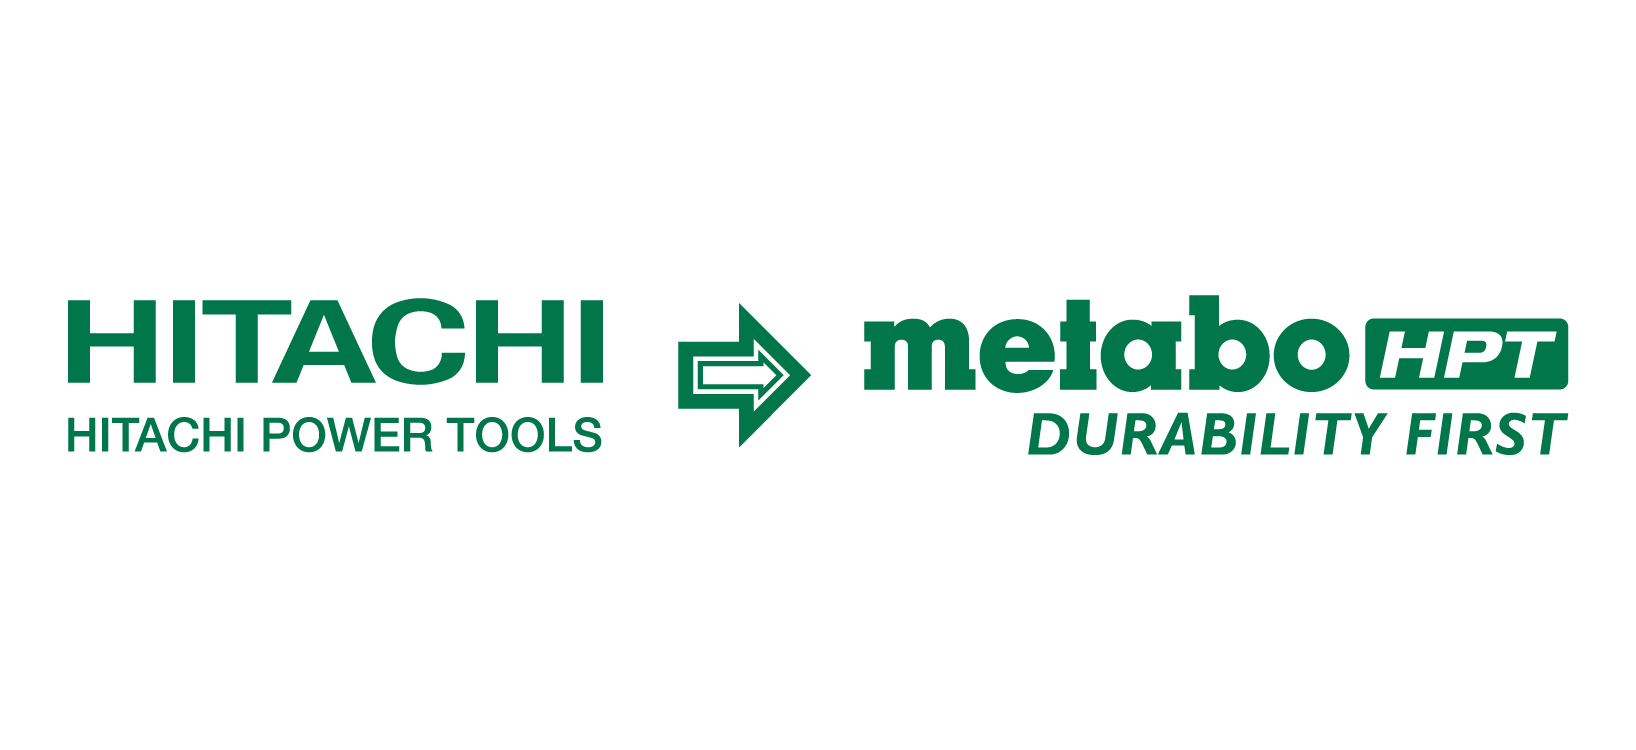 Hitachi is now Metabo HPT